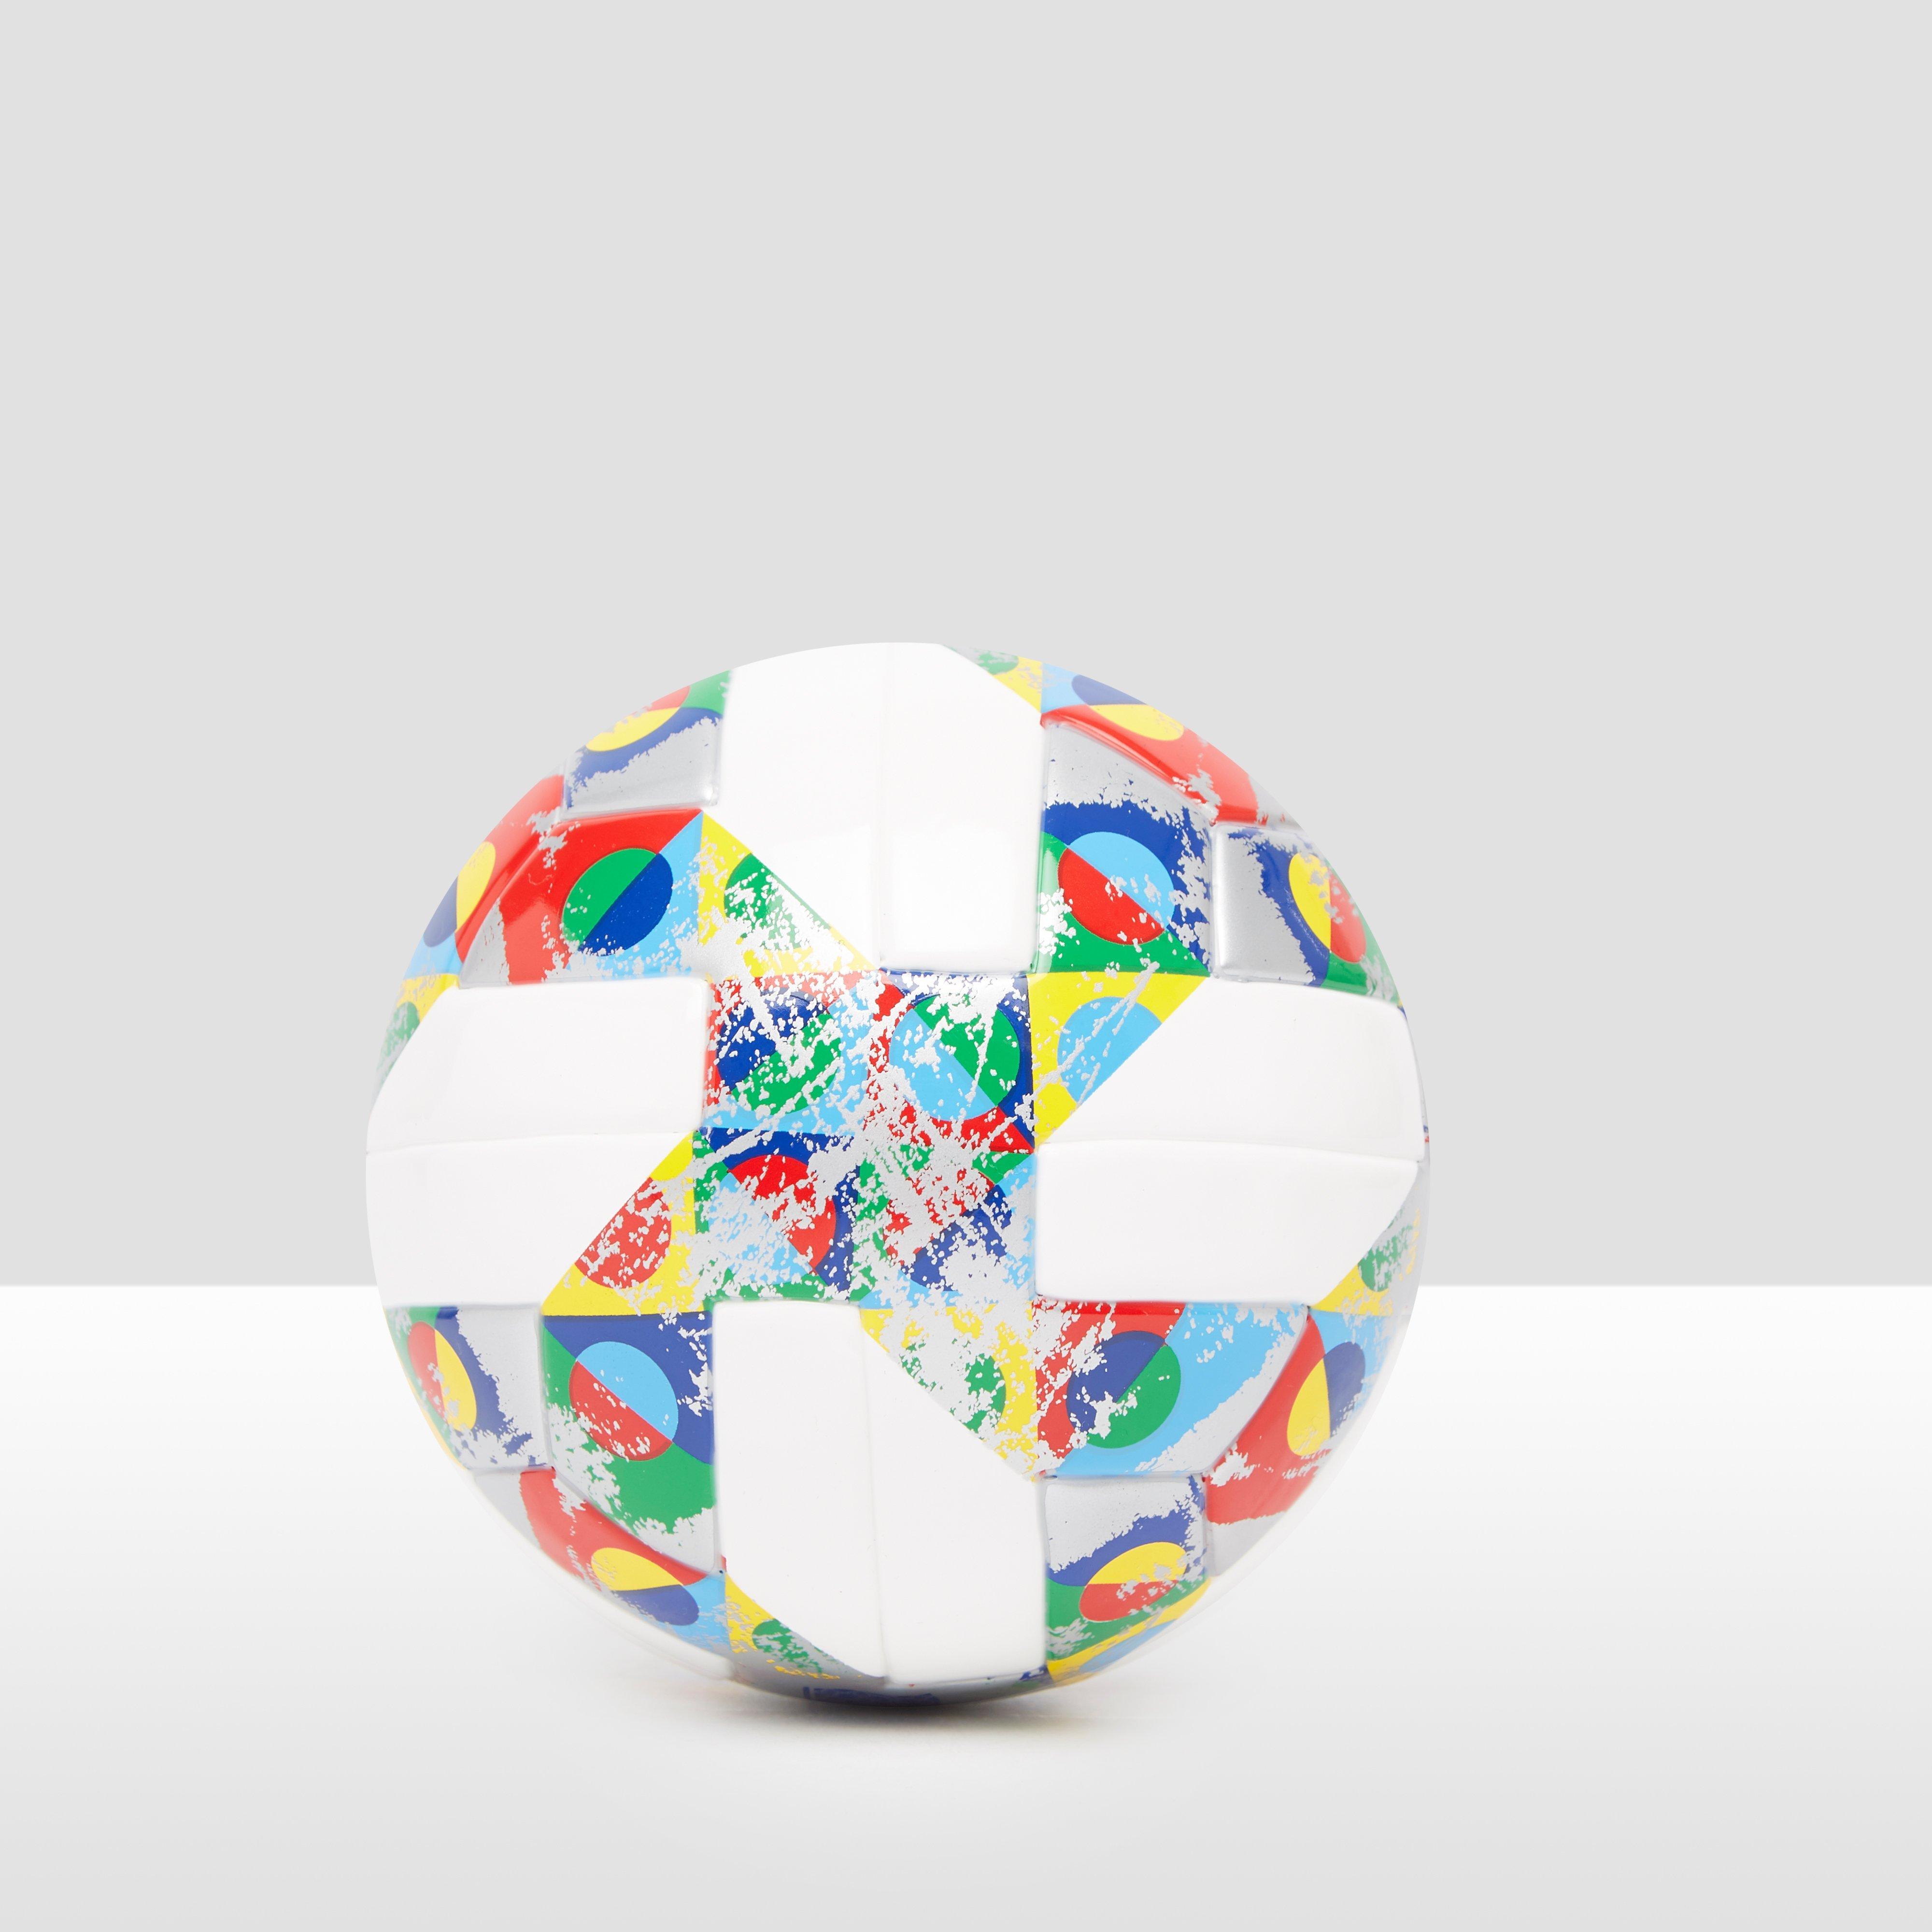 ADIDAS UEFA NATIONS LEAGUE MINI VOETBAL WIT/GEEL